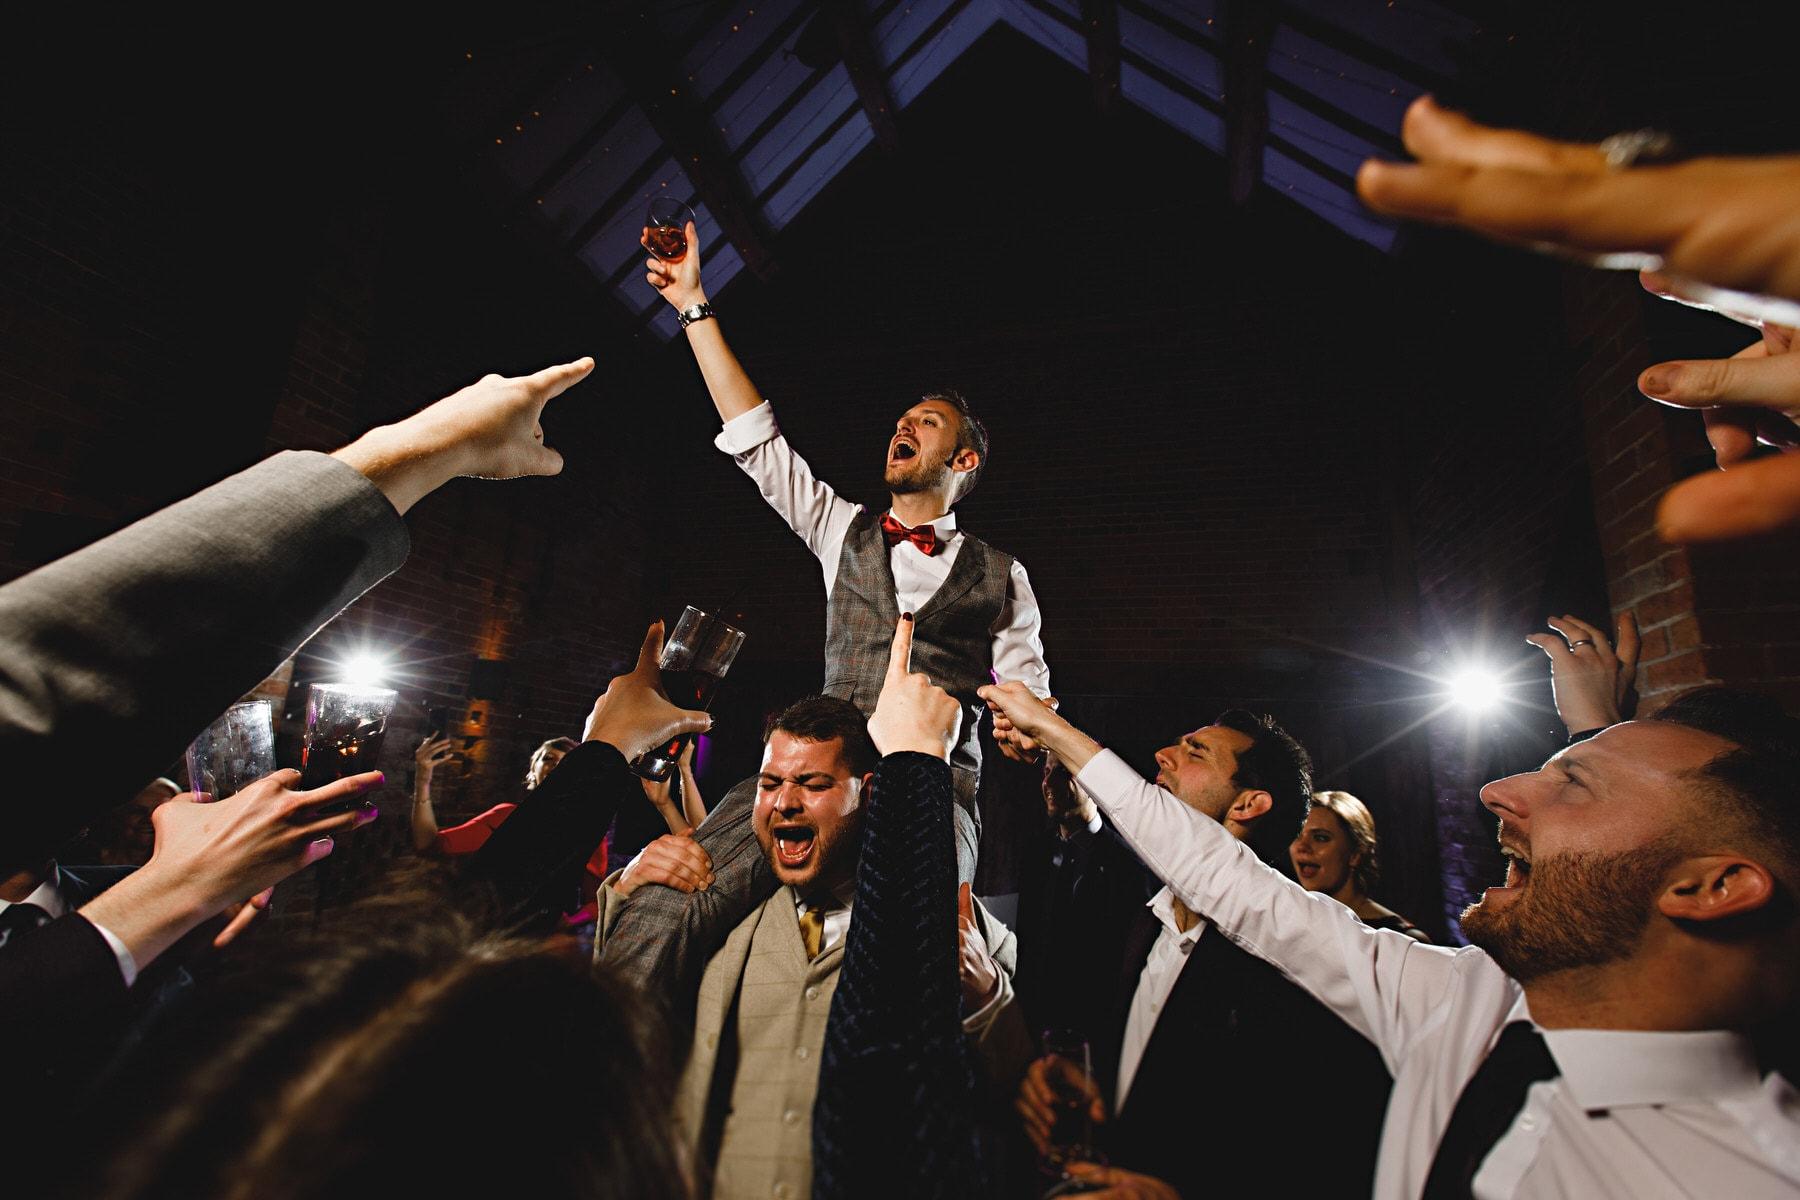 dance floor party at Shustoke Barns in Warwickshire